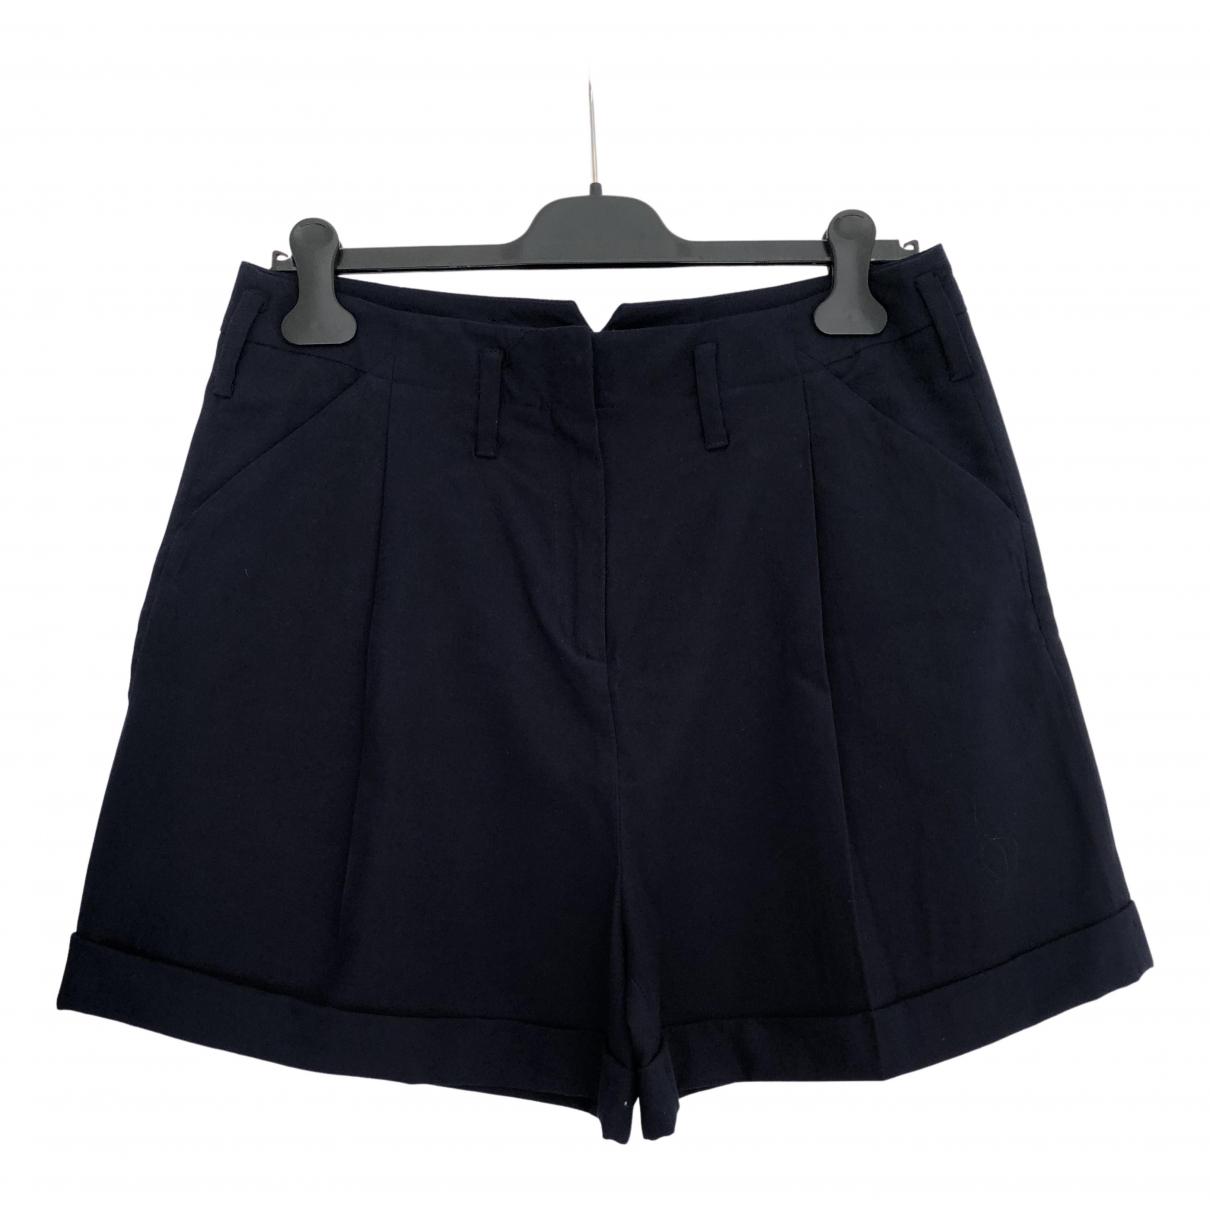 Max & Co \N Shorts in  Blau Viskose